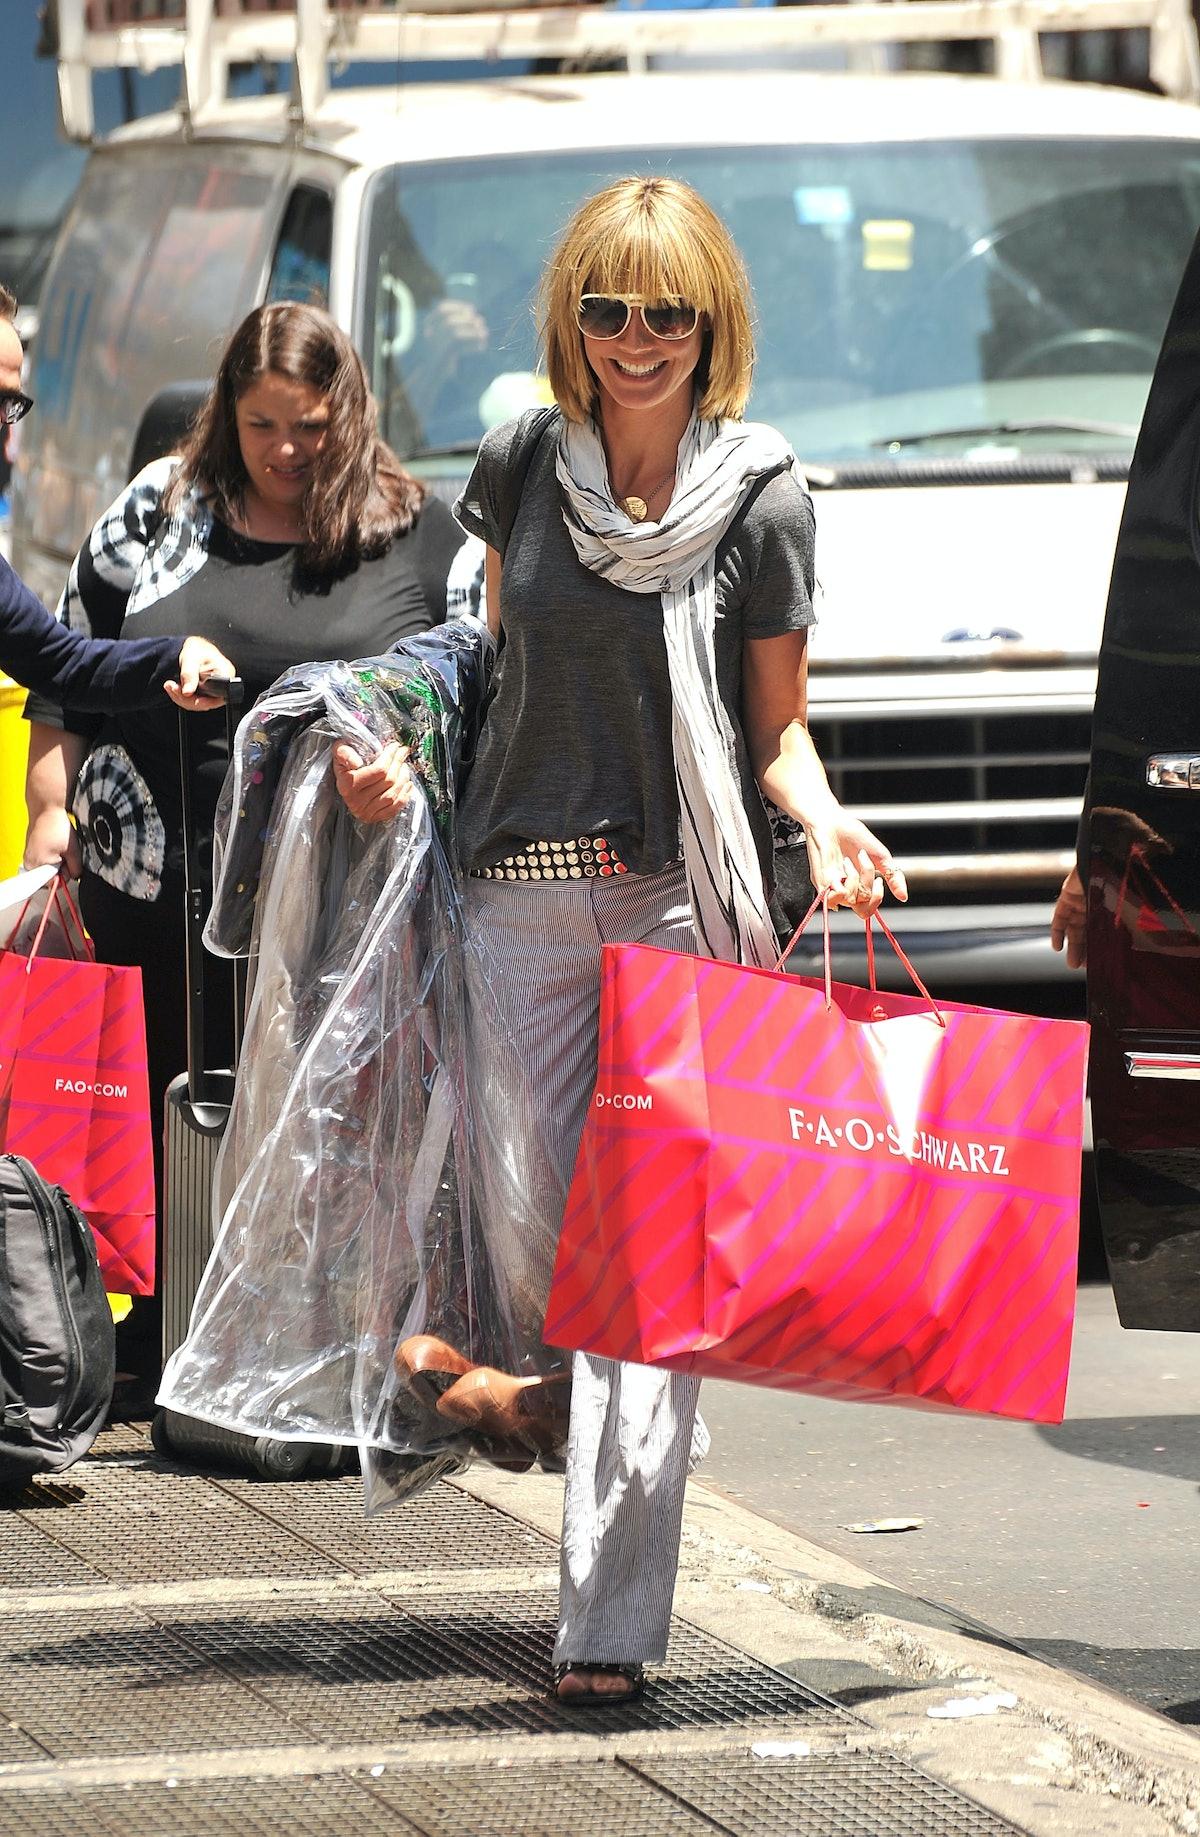 Celebrity Sightings In New York City - July 12, 2010